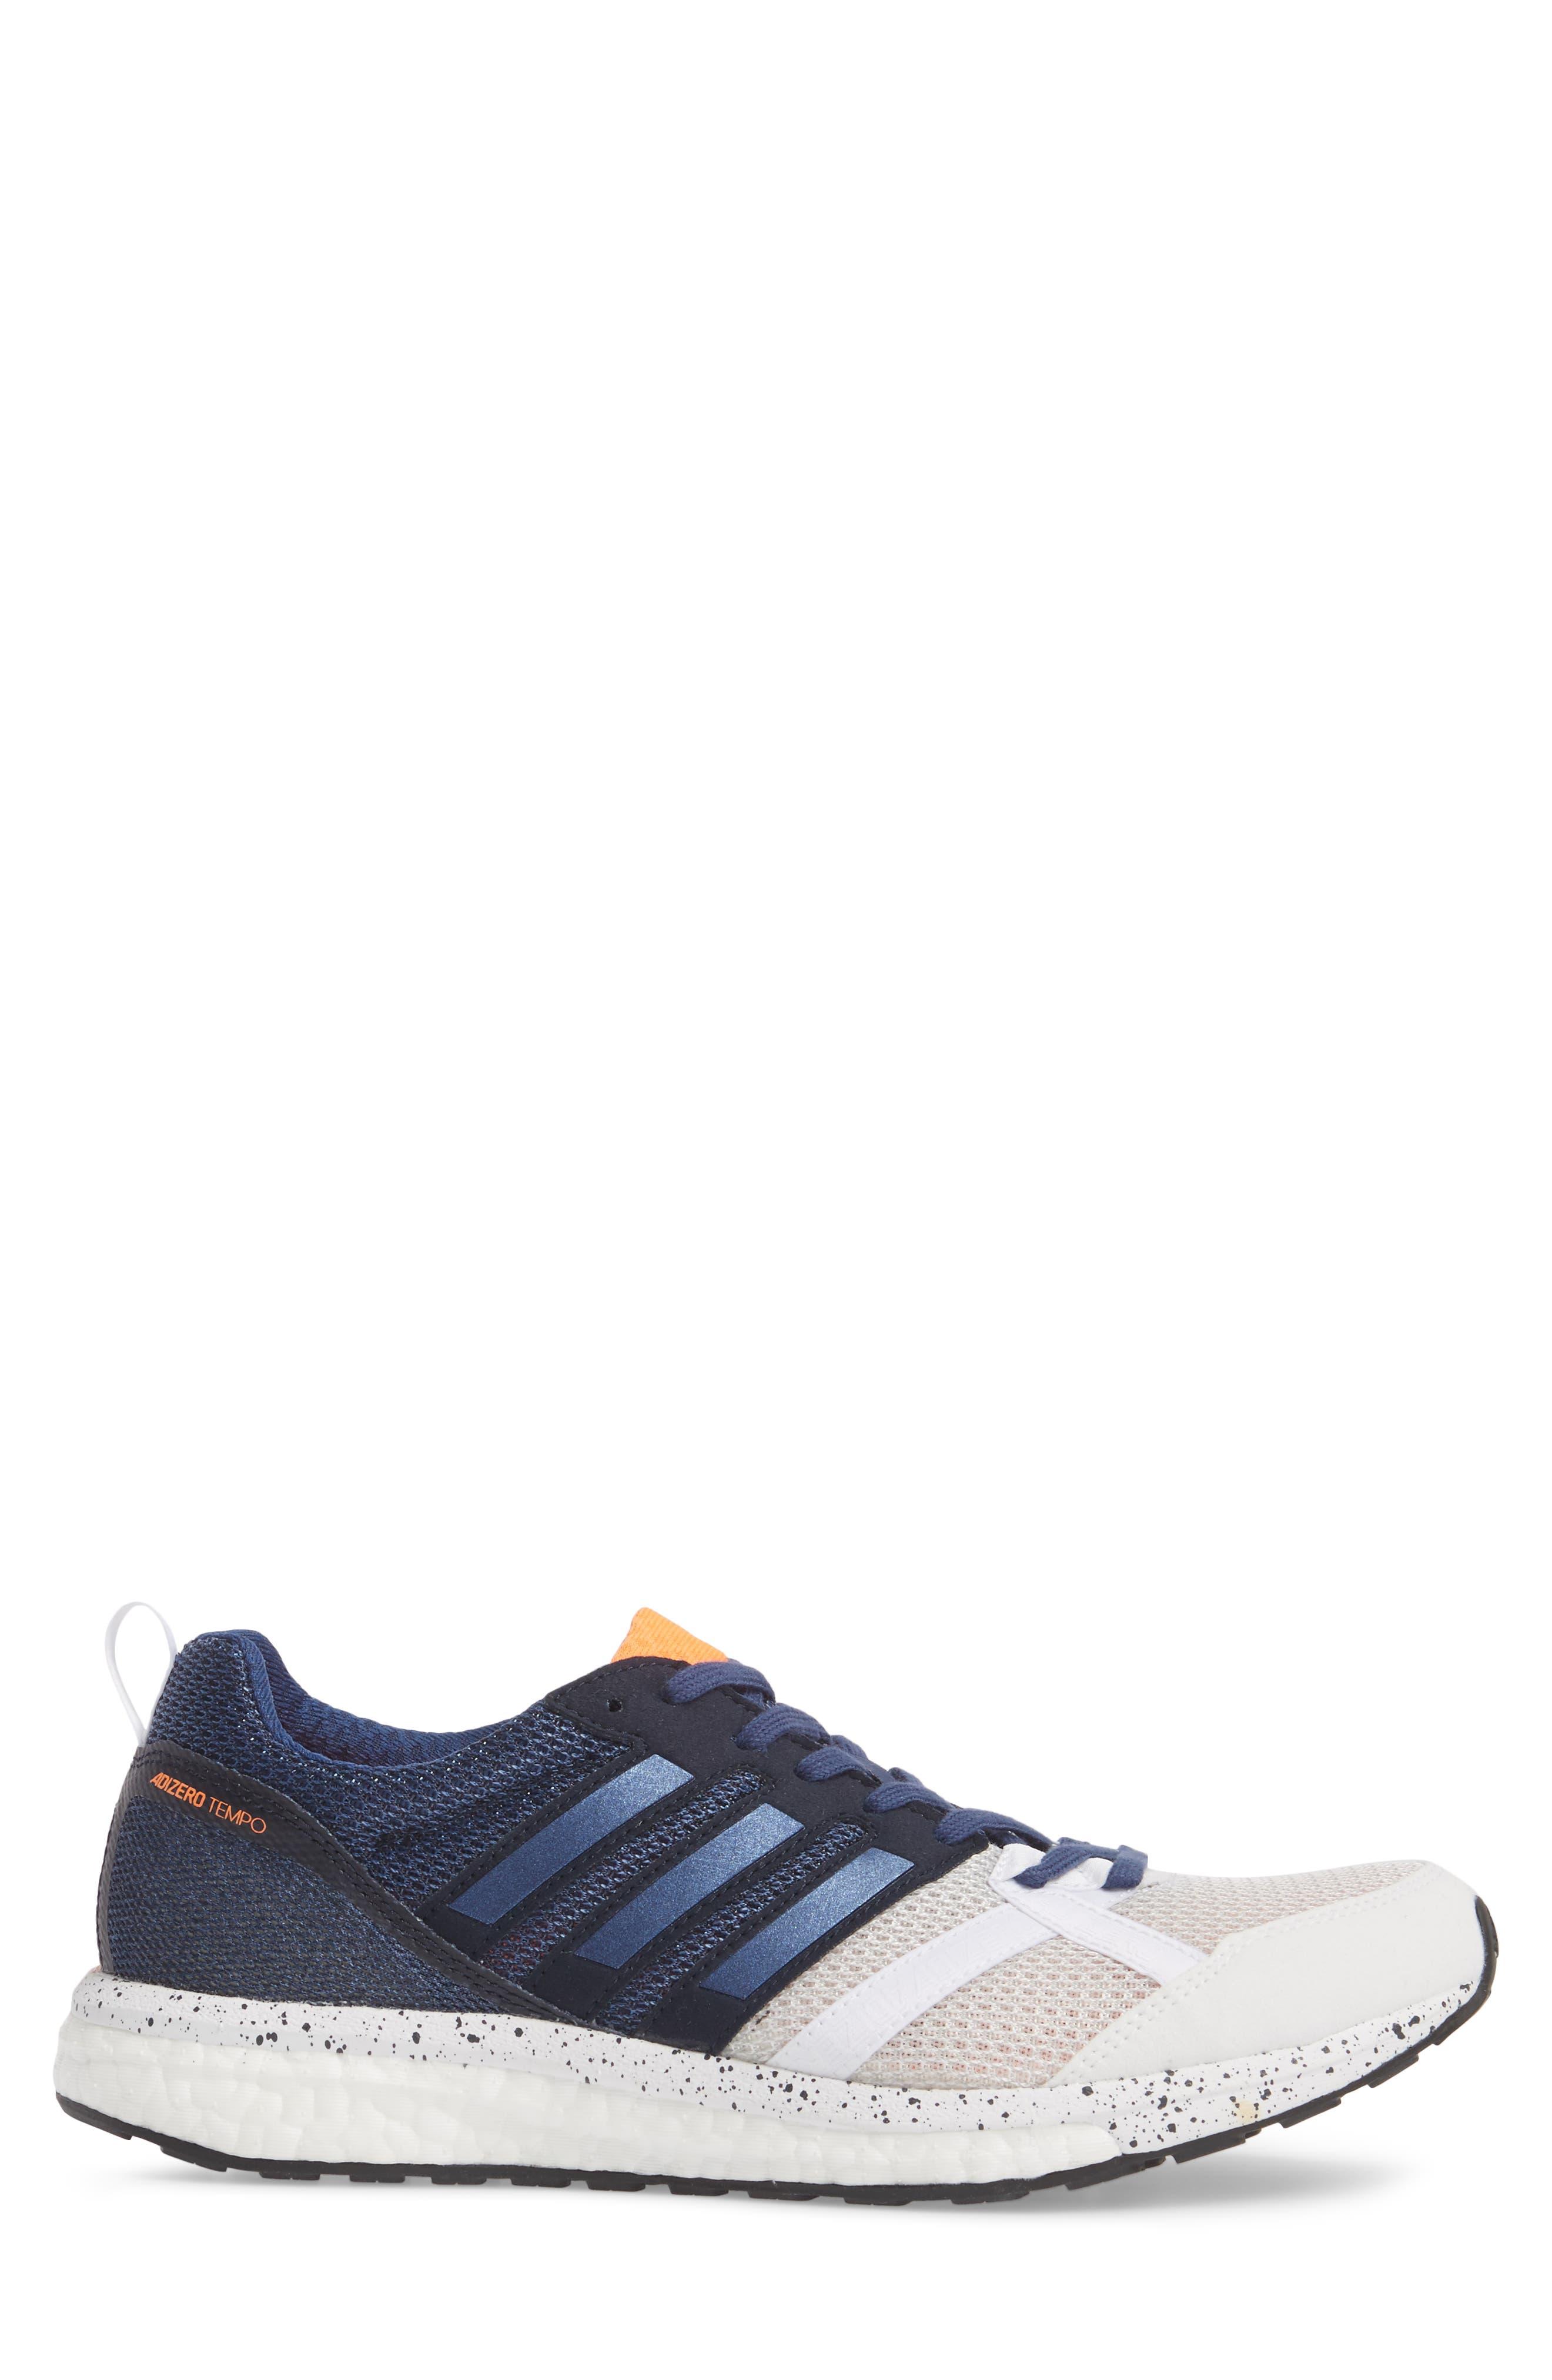 Adizero Tempo 9 M Running Shoe,                             Alternate thumbnail 3, color,                             White/ Indigo/ Core Black